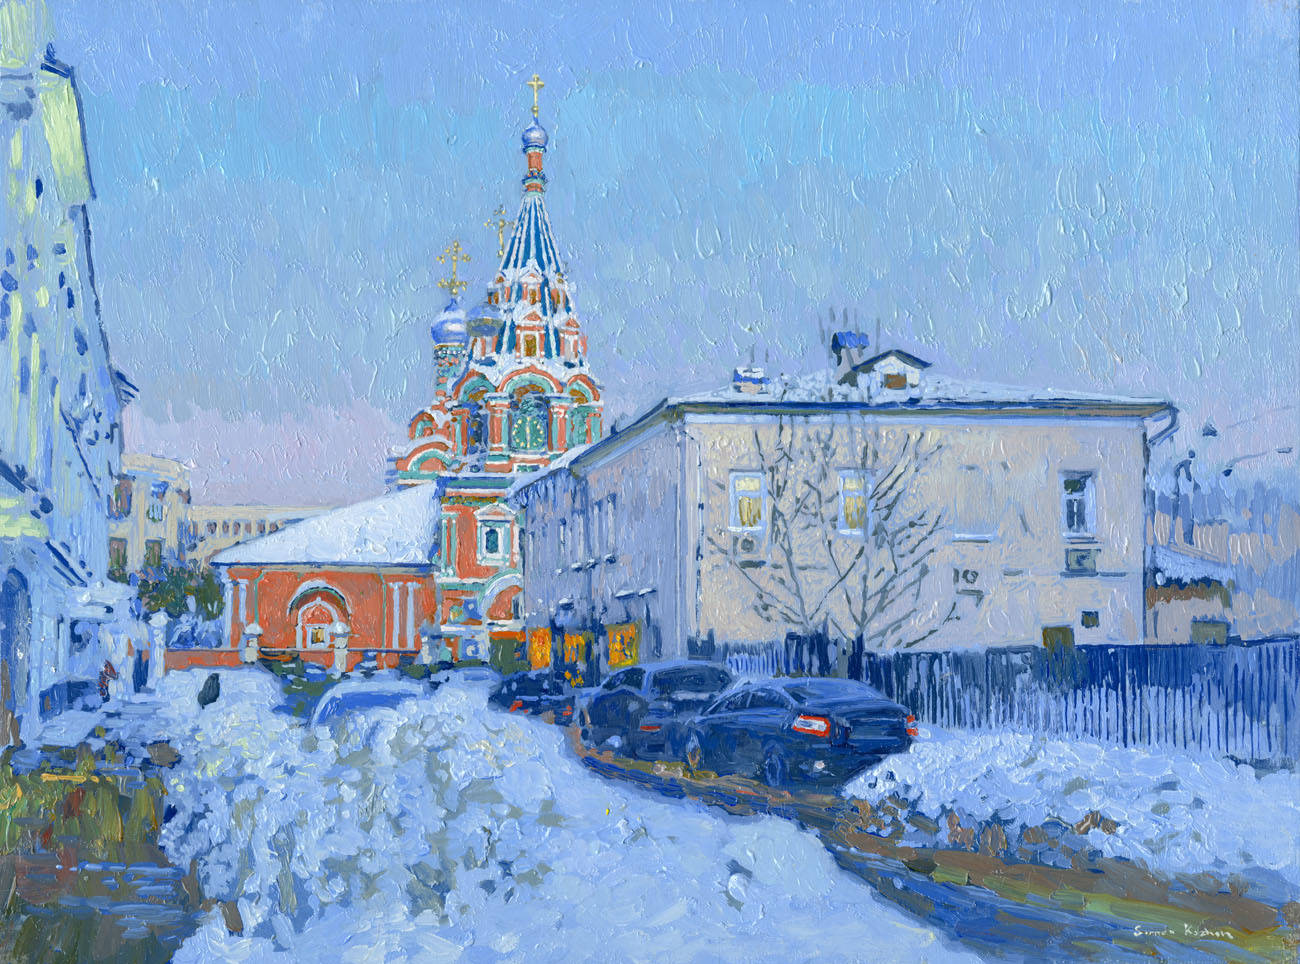 Brodnikov alley. The Church of St. Gregory Bishop Neokesariysky in Derbitsah. Of 2013. Oil on canvas on cardboard, oil. 30 x 40 cm.